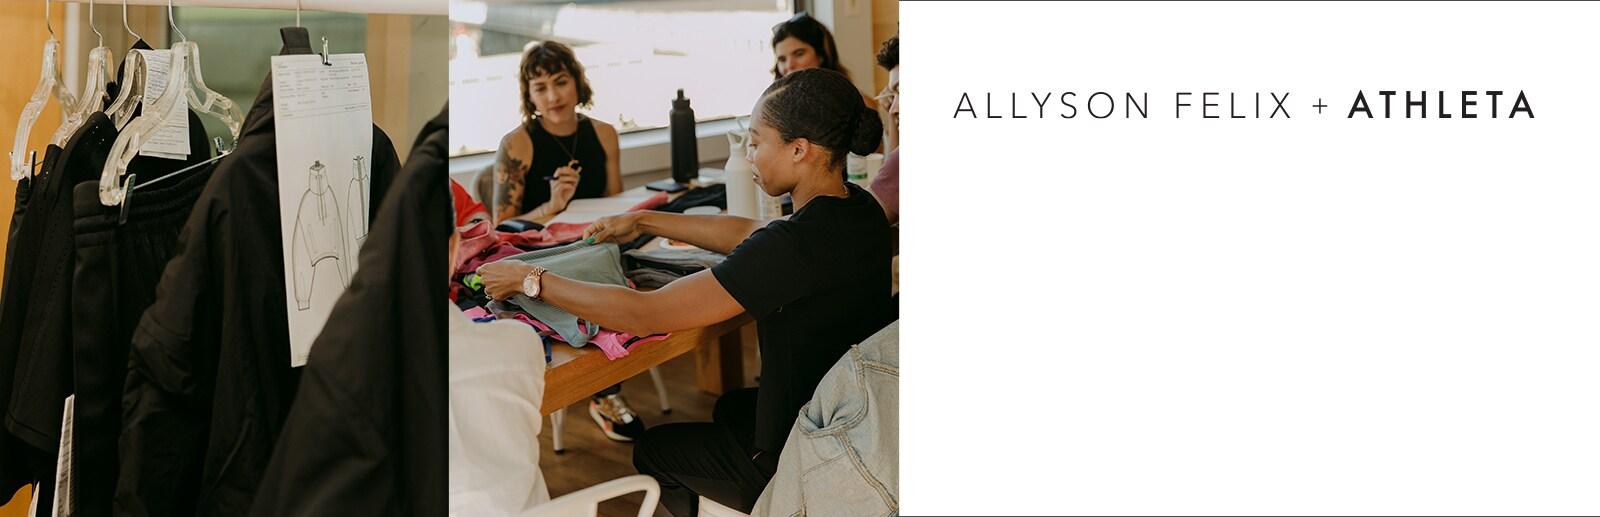 allyson felix designing her line with athleta